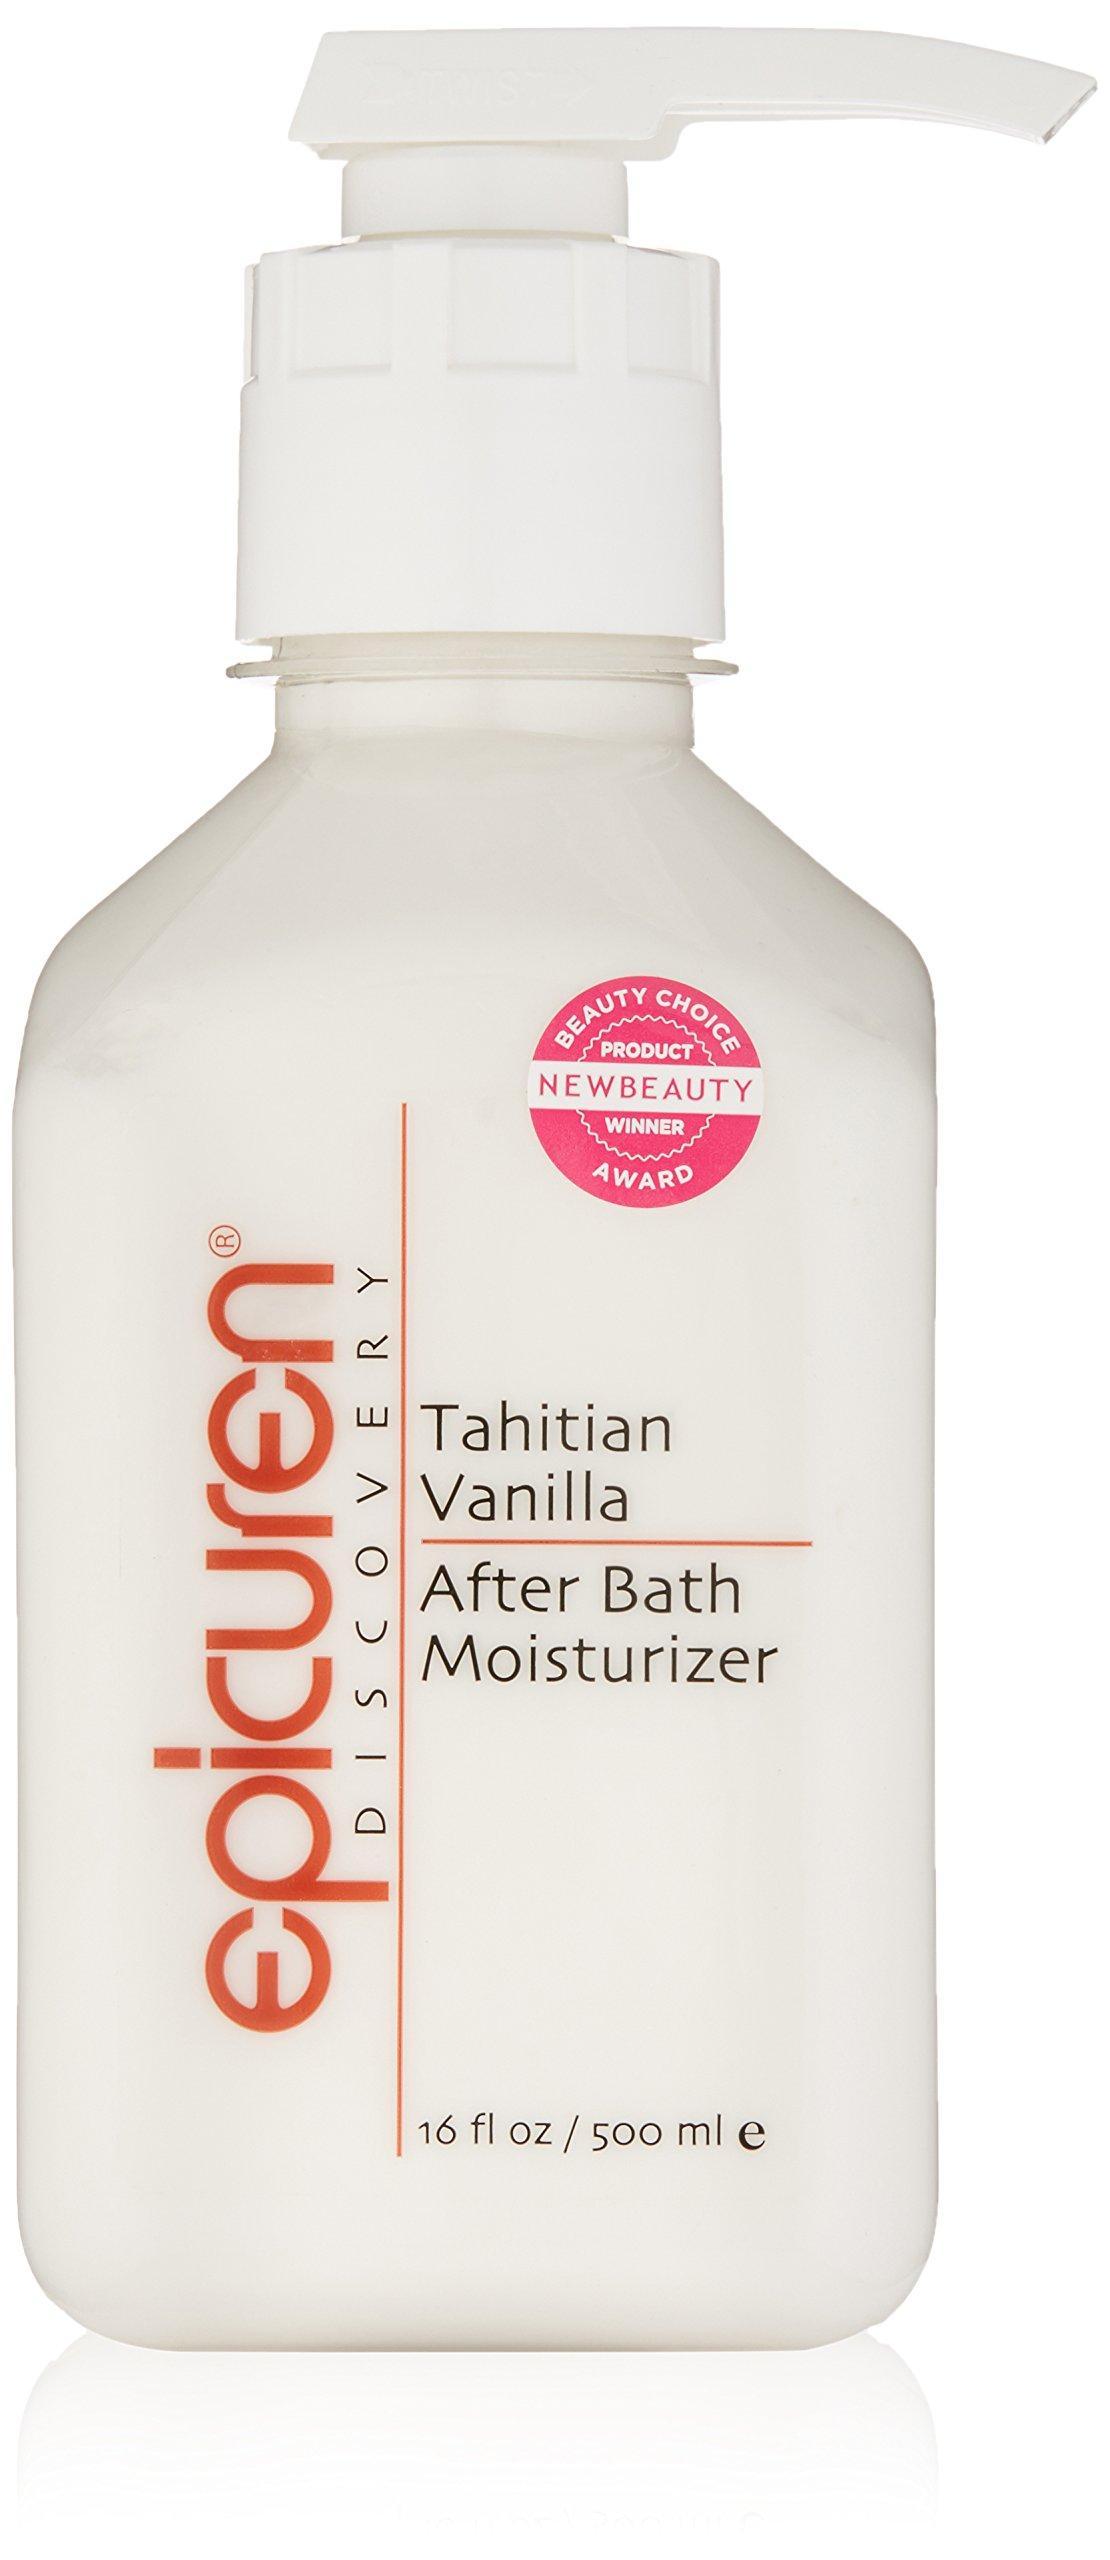 Epicuren Discovery Tahitian Vanilla After Bath Body Moisturizer, 16 Fl oz